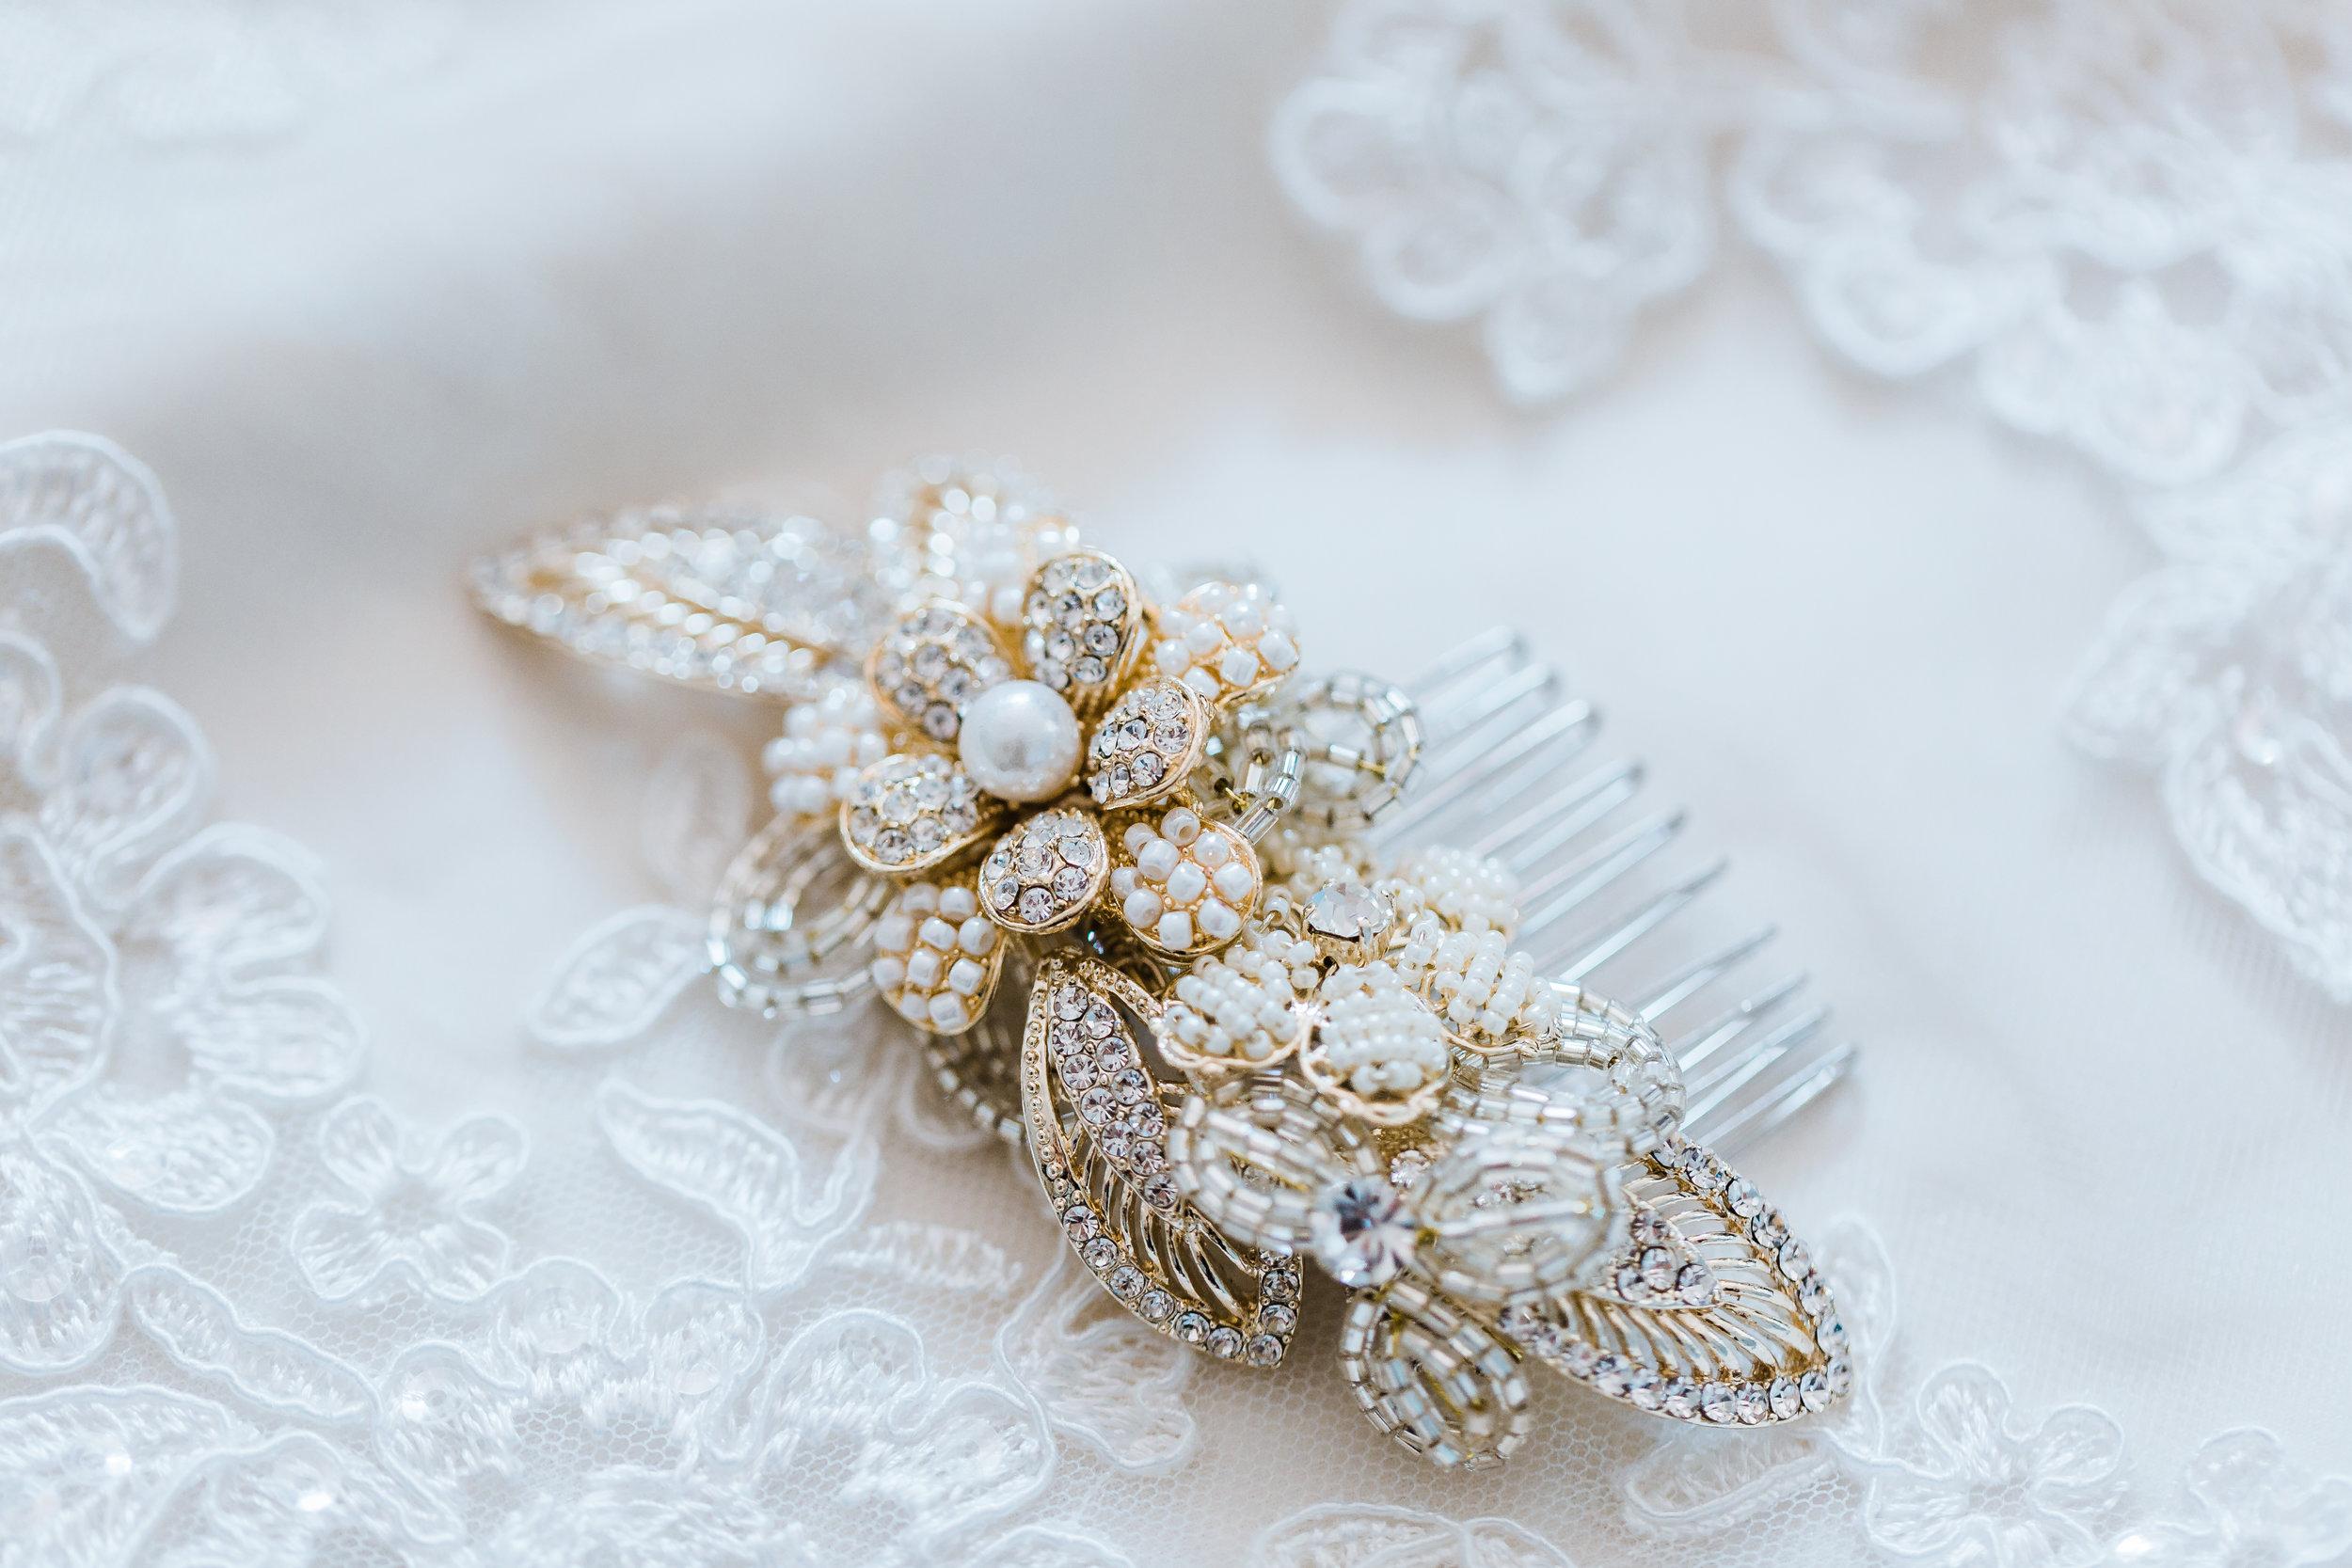 brides hair piece for her maryland wedding - disney inspo - top md wedding photographer